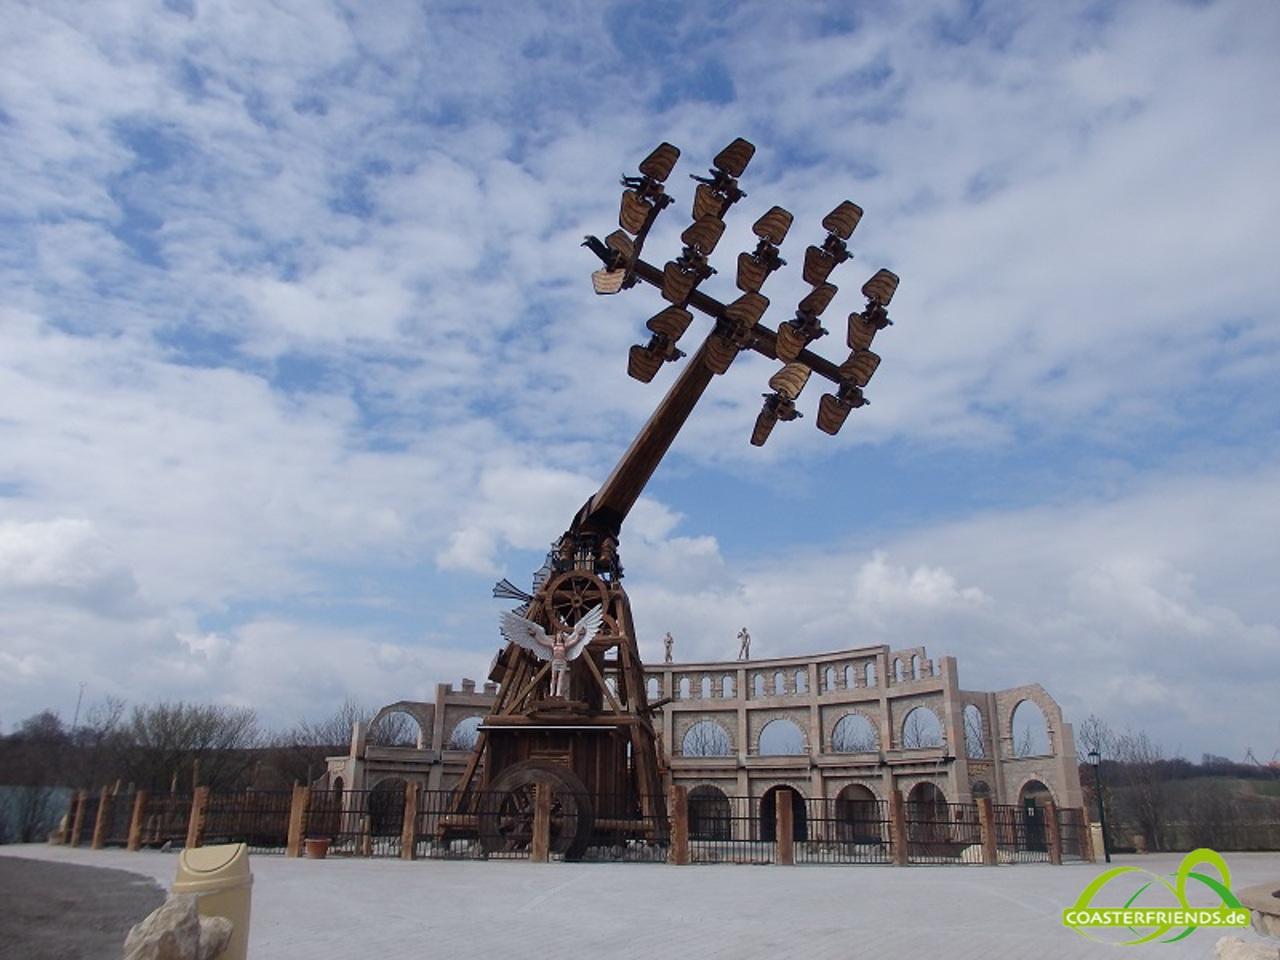 Europa - https://coasterfriends.de/joomla//images/pcp_parkdetails/europa/o784_familypark/content3.jpg